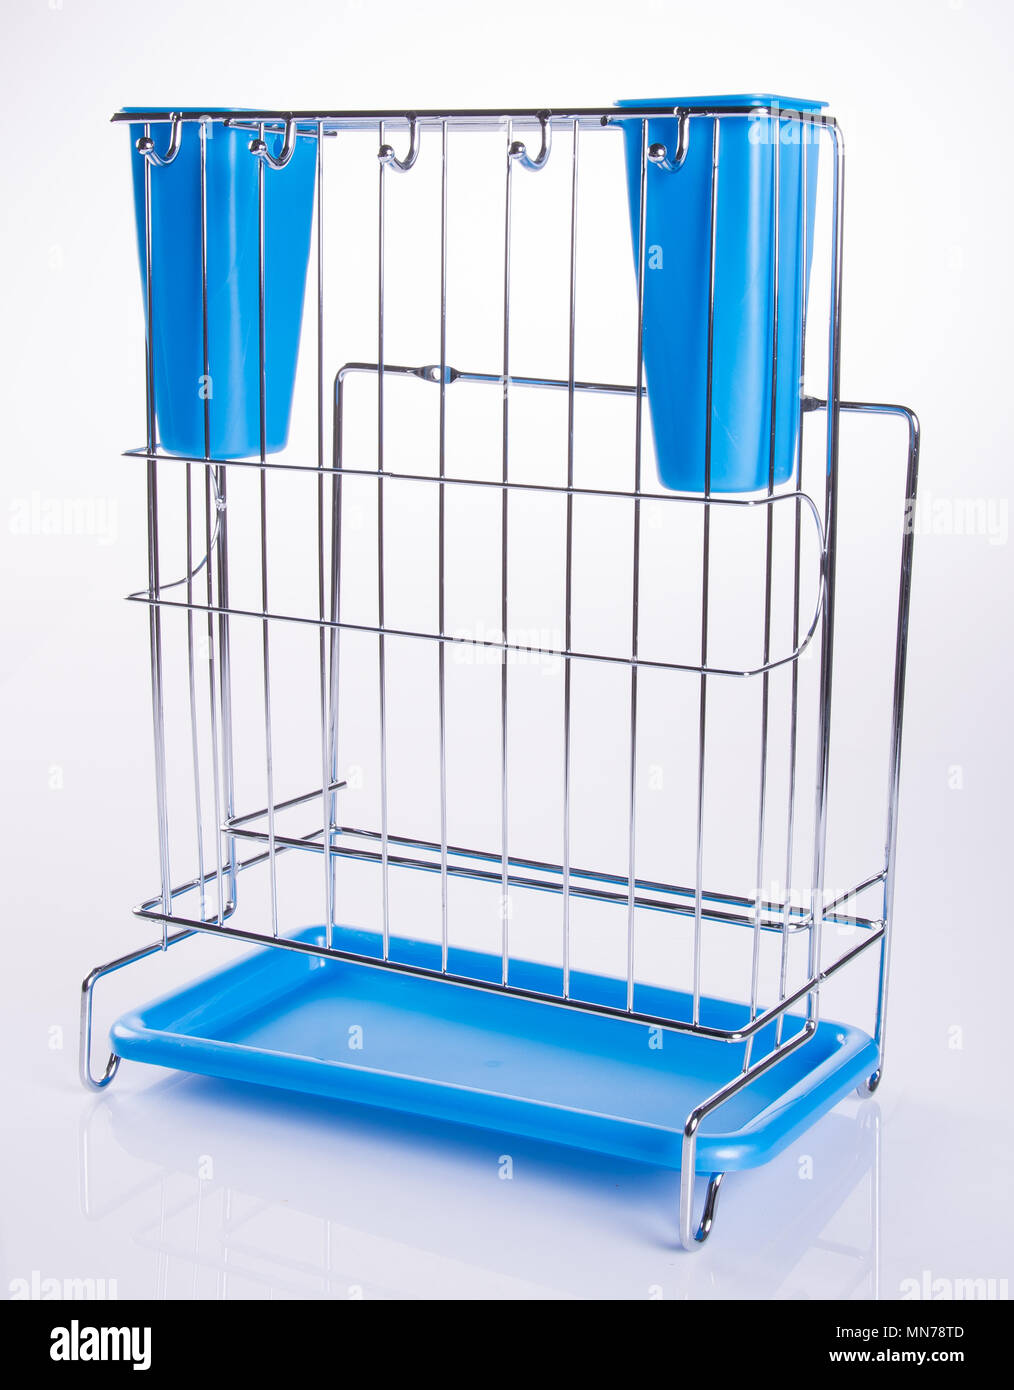 Kitchen utensils holder or Cutlery holder on background Stock Photo